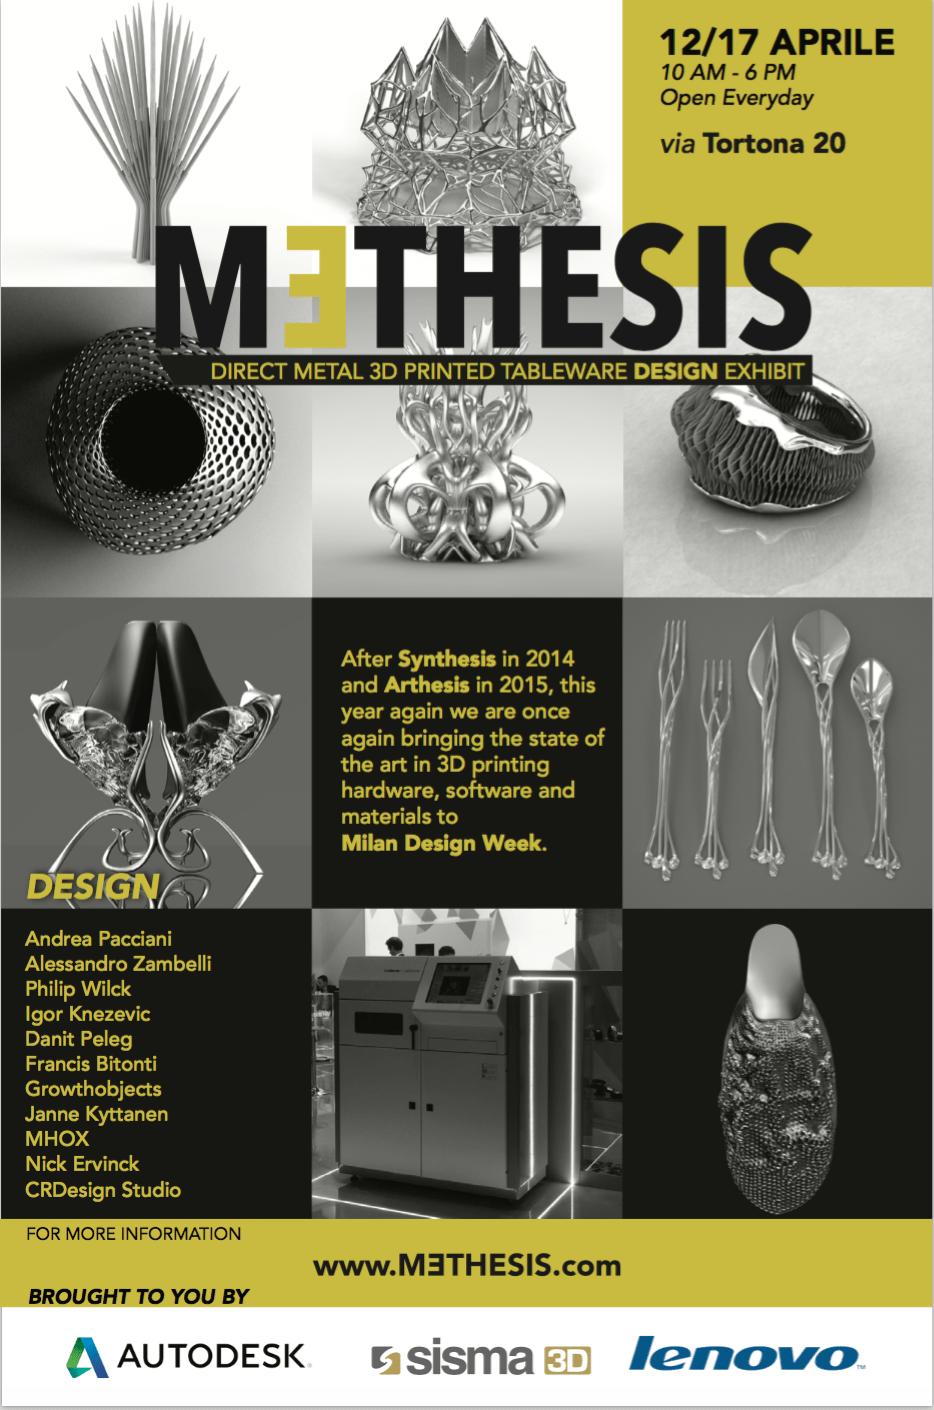 MTHESIS Event Takes Metal 3D Printing to Milan Design